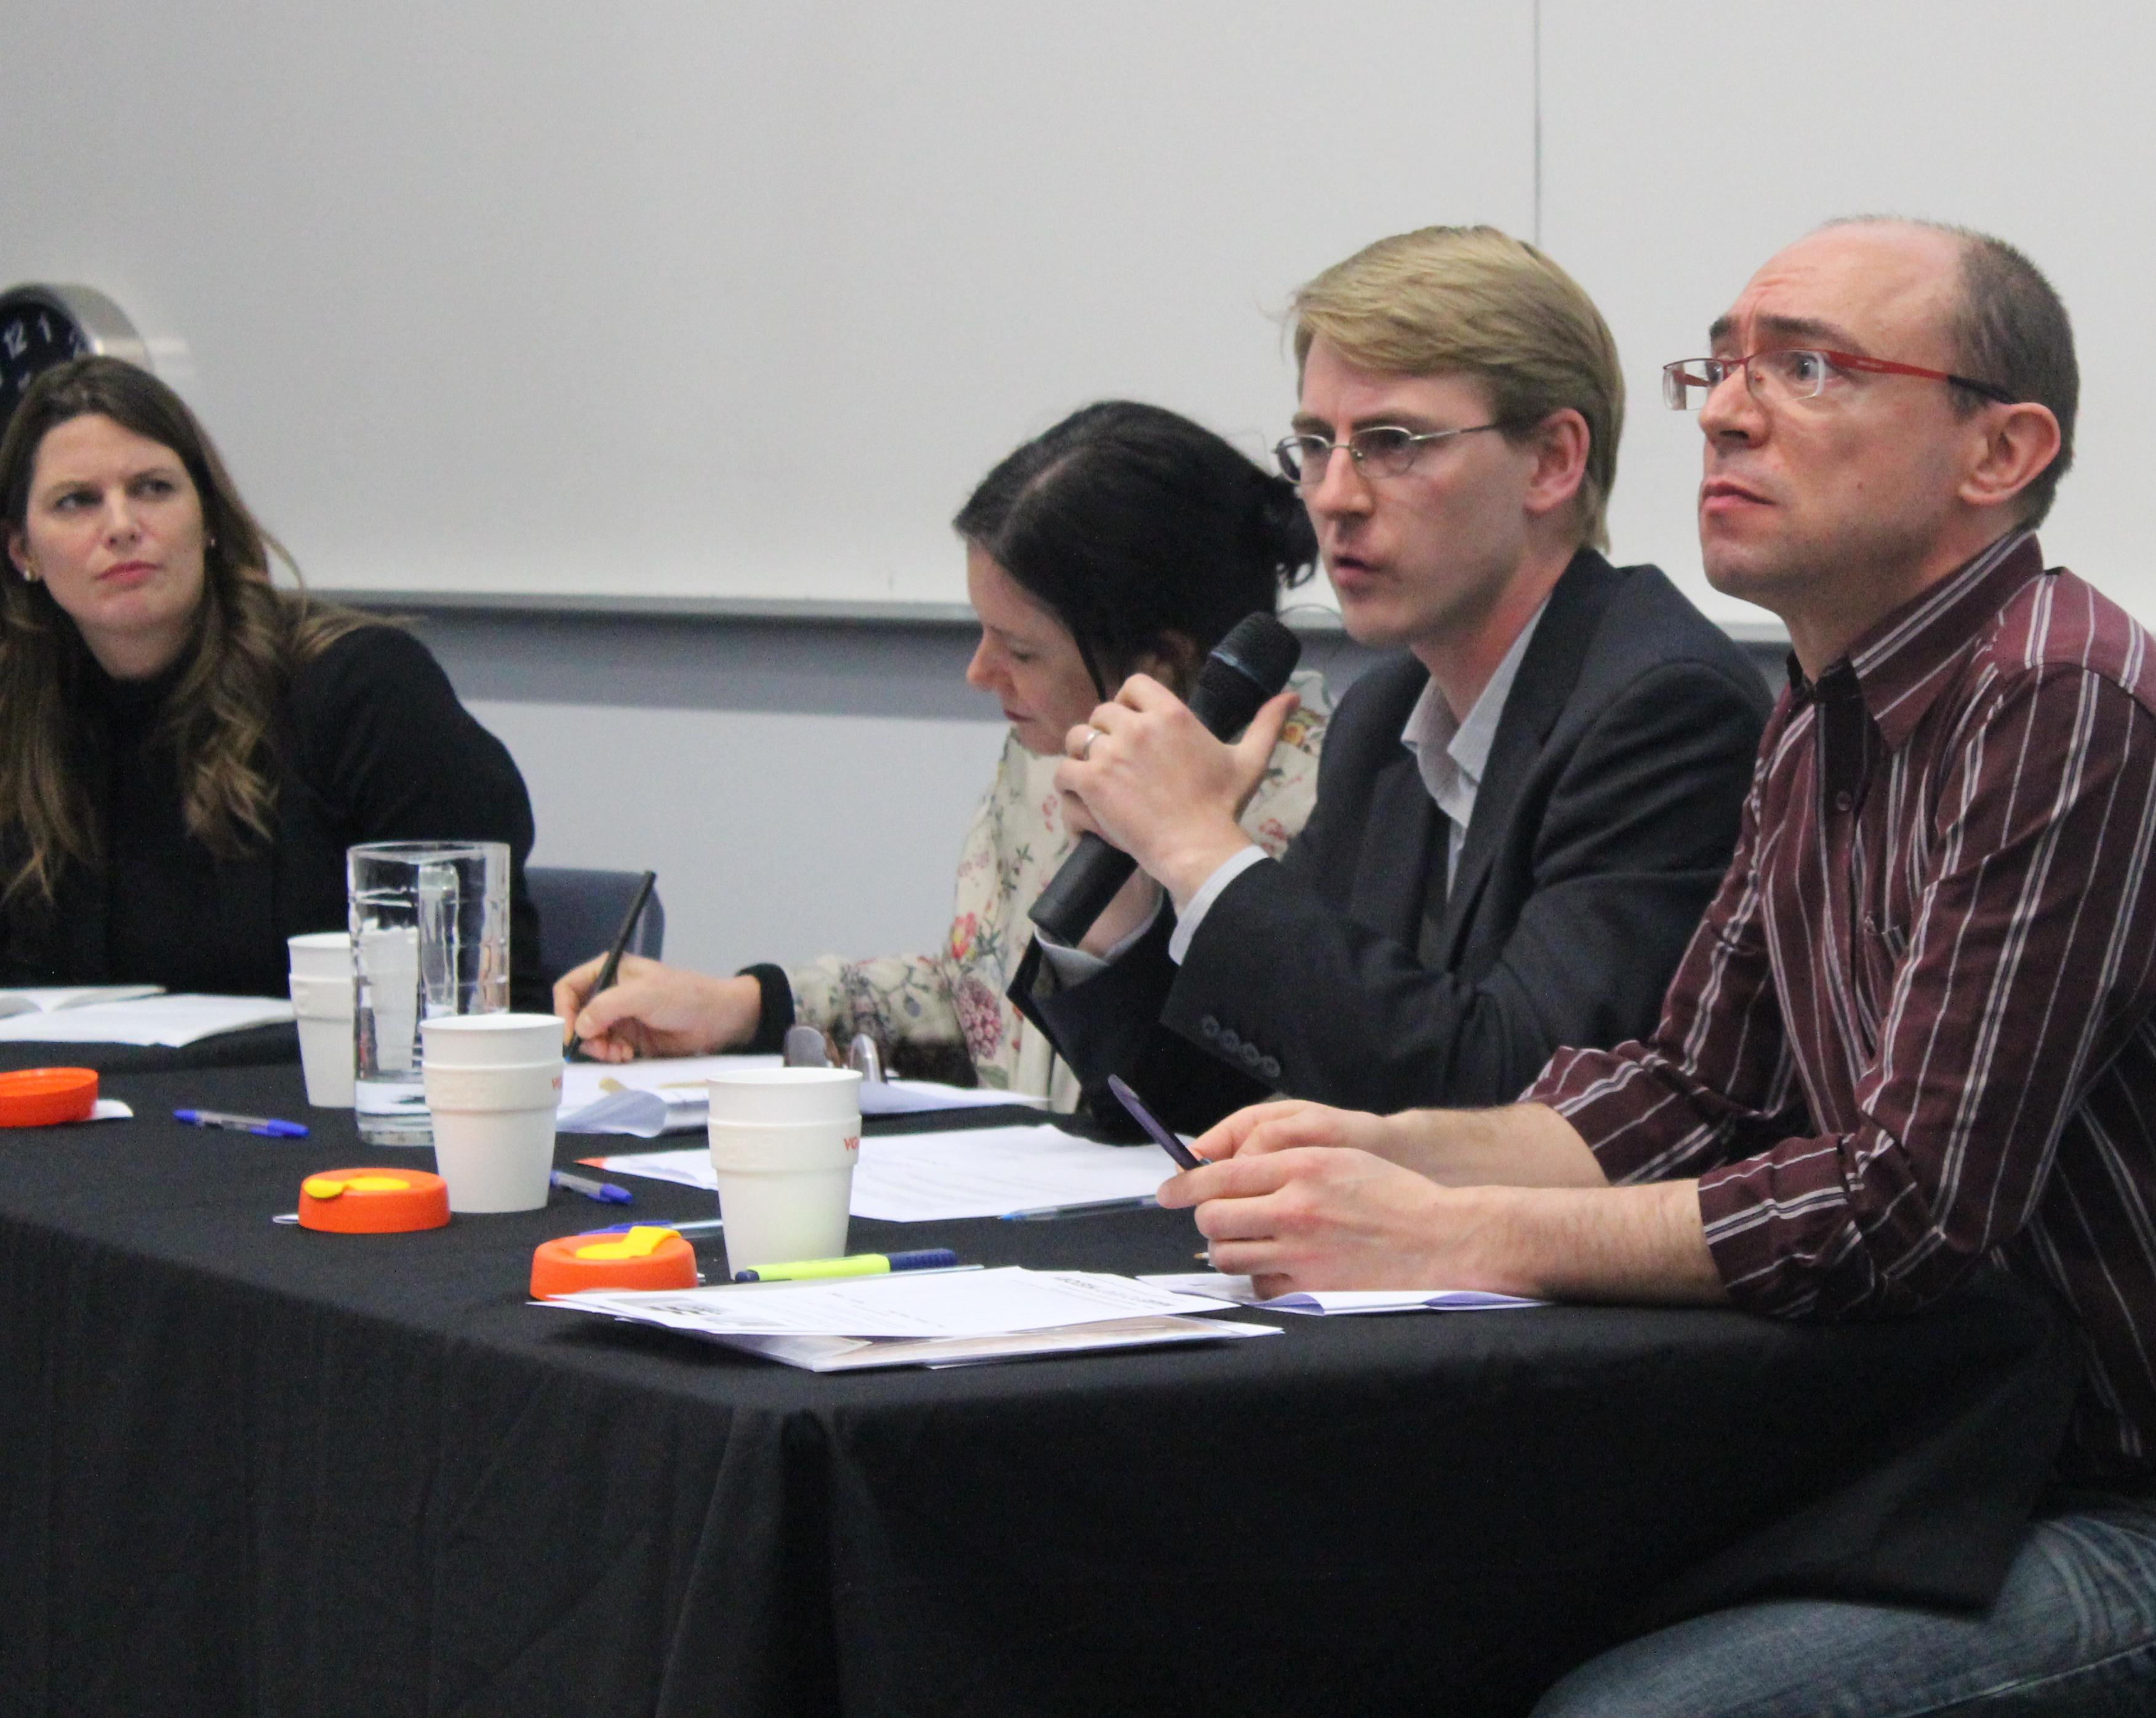 Michael Cornish, 2 August 2013, Adelaide Aid Electoral Forum